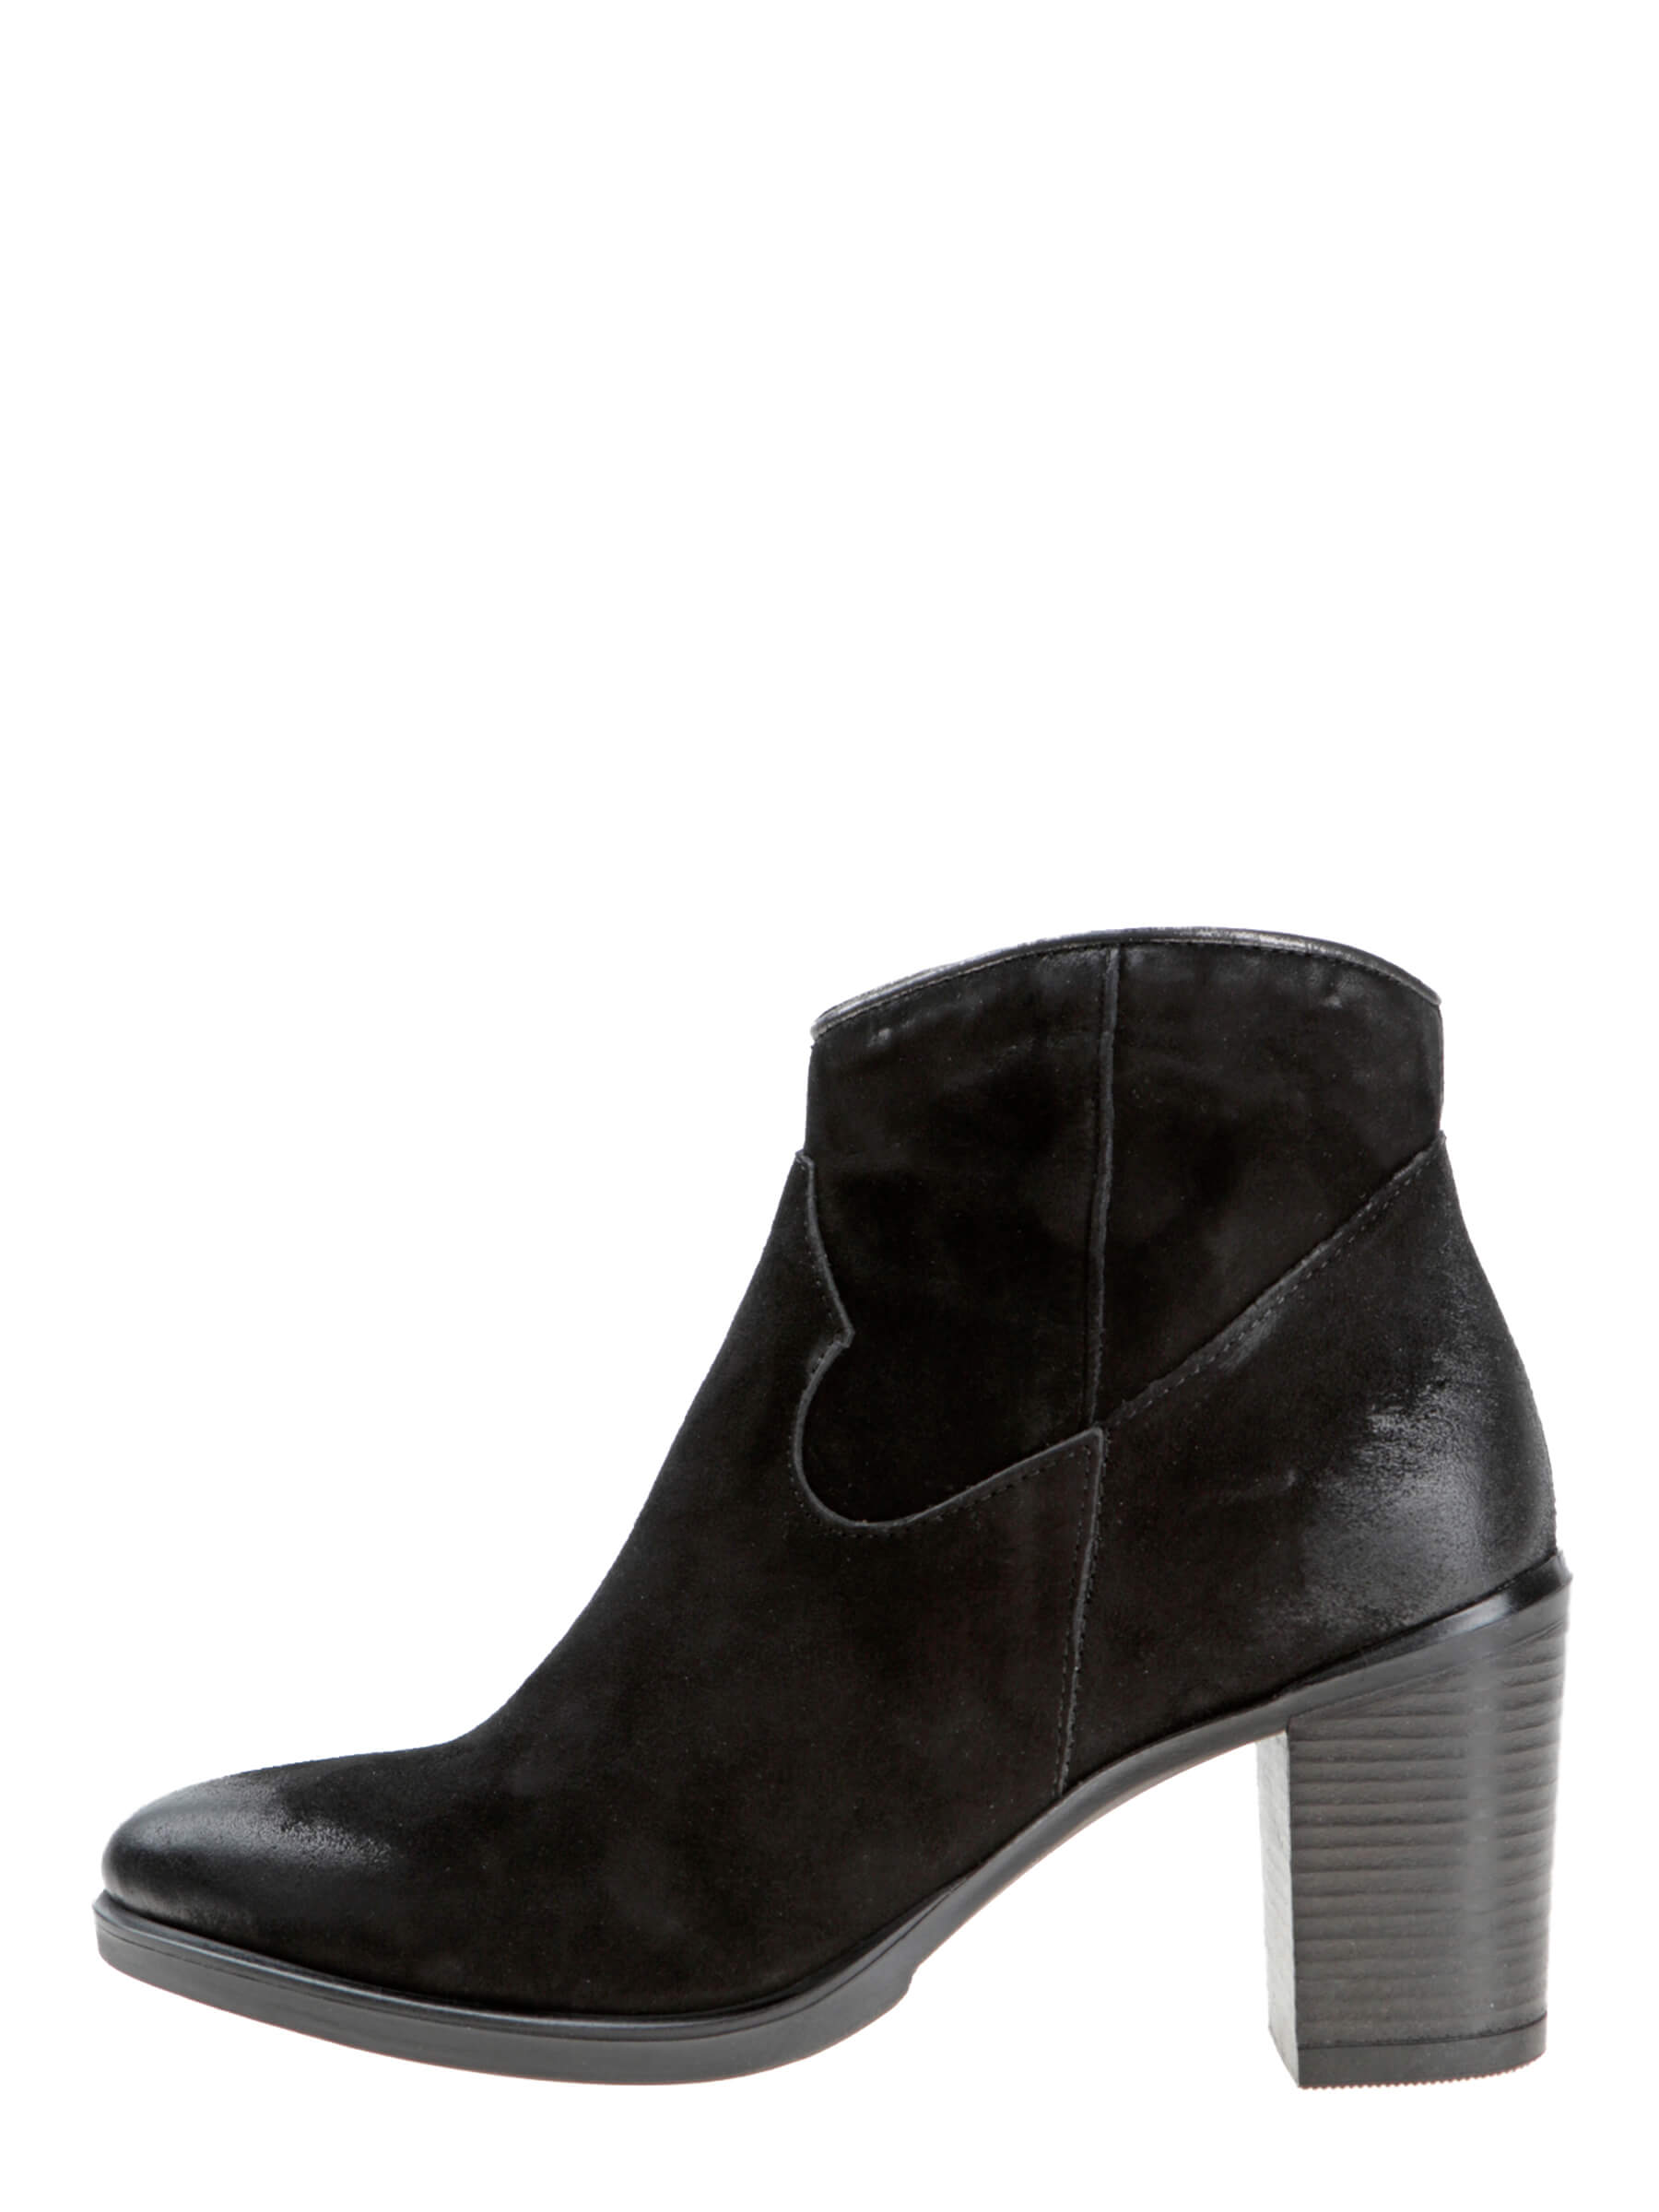 Mjus : Damenschuhe High Heels Online Kaufen Aktuelle